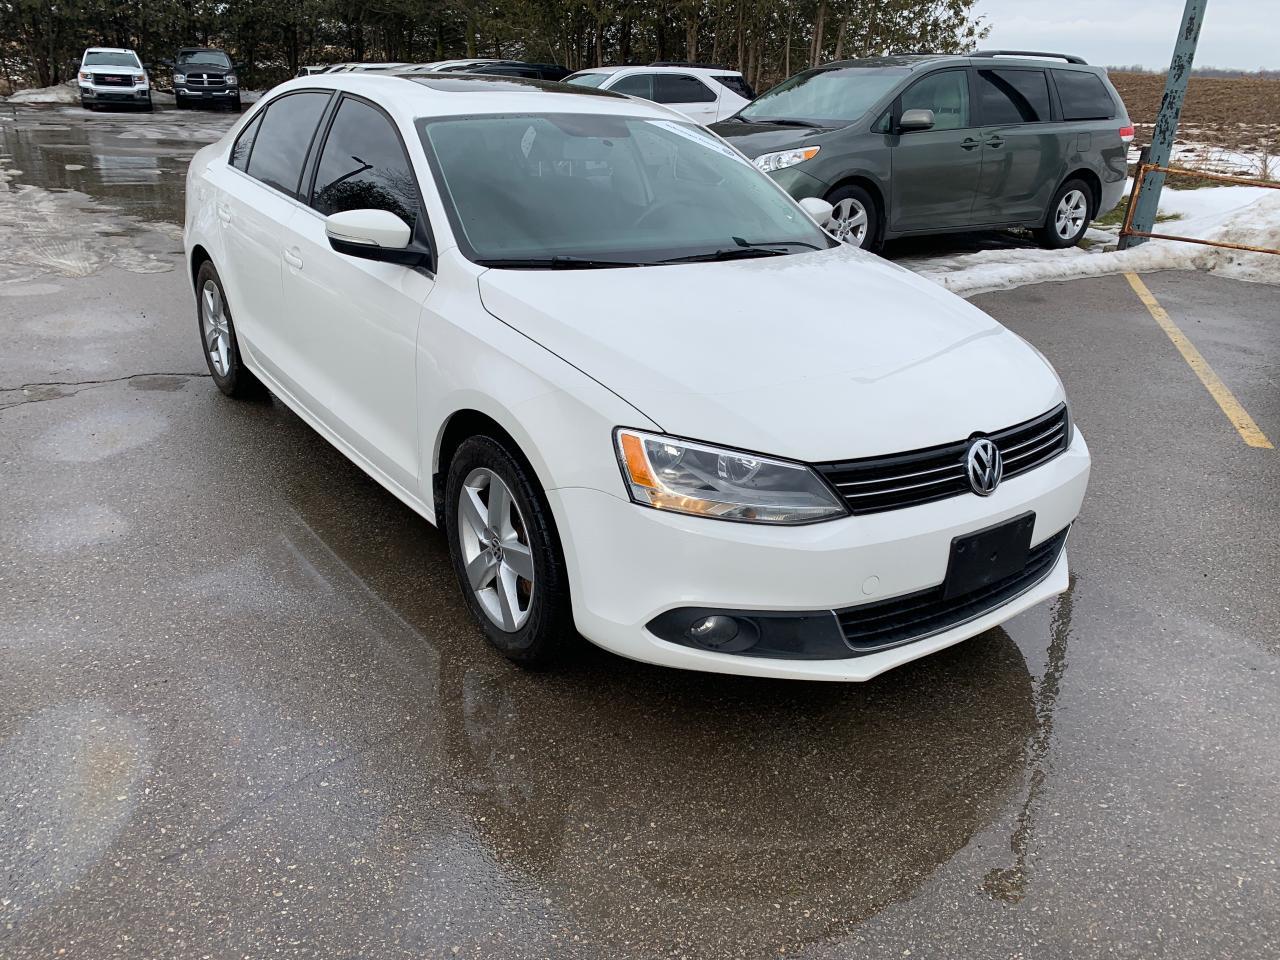 Photo of White 2013 Volkswagen Jetta